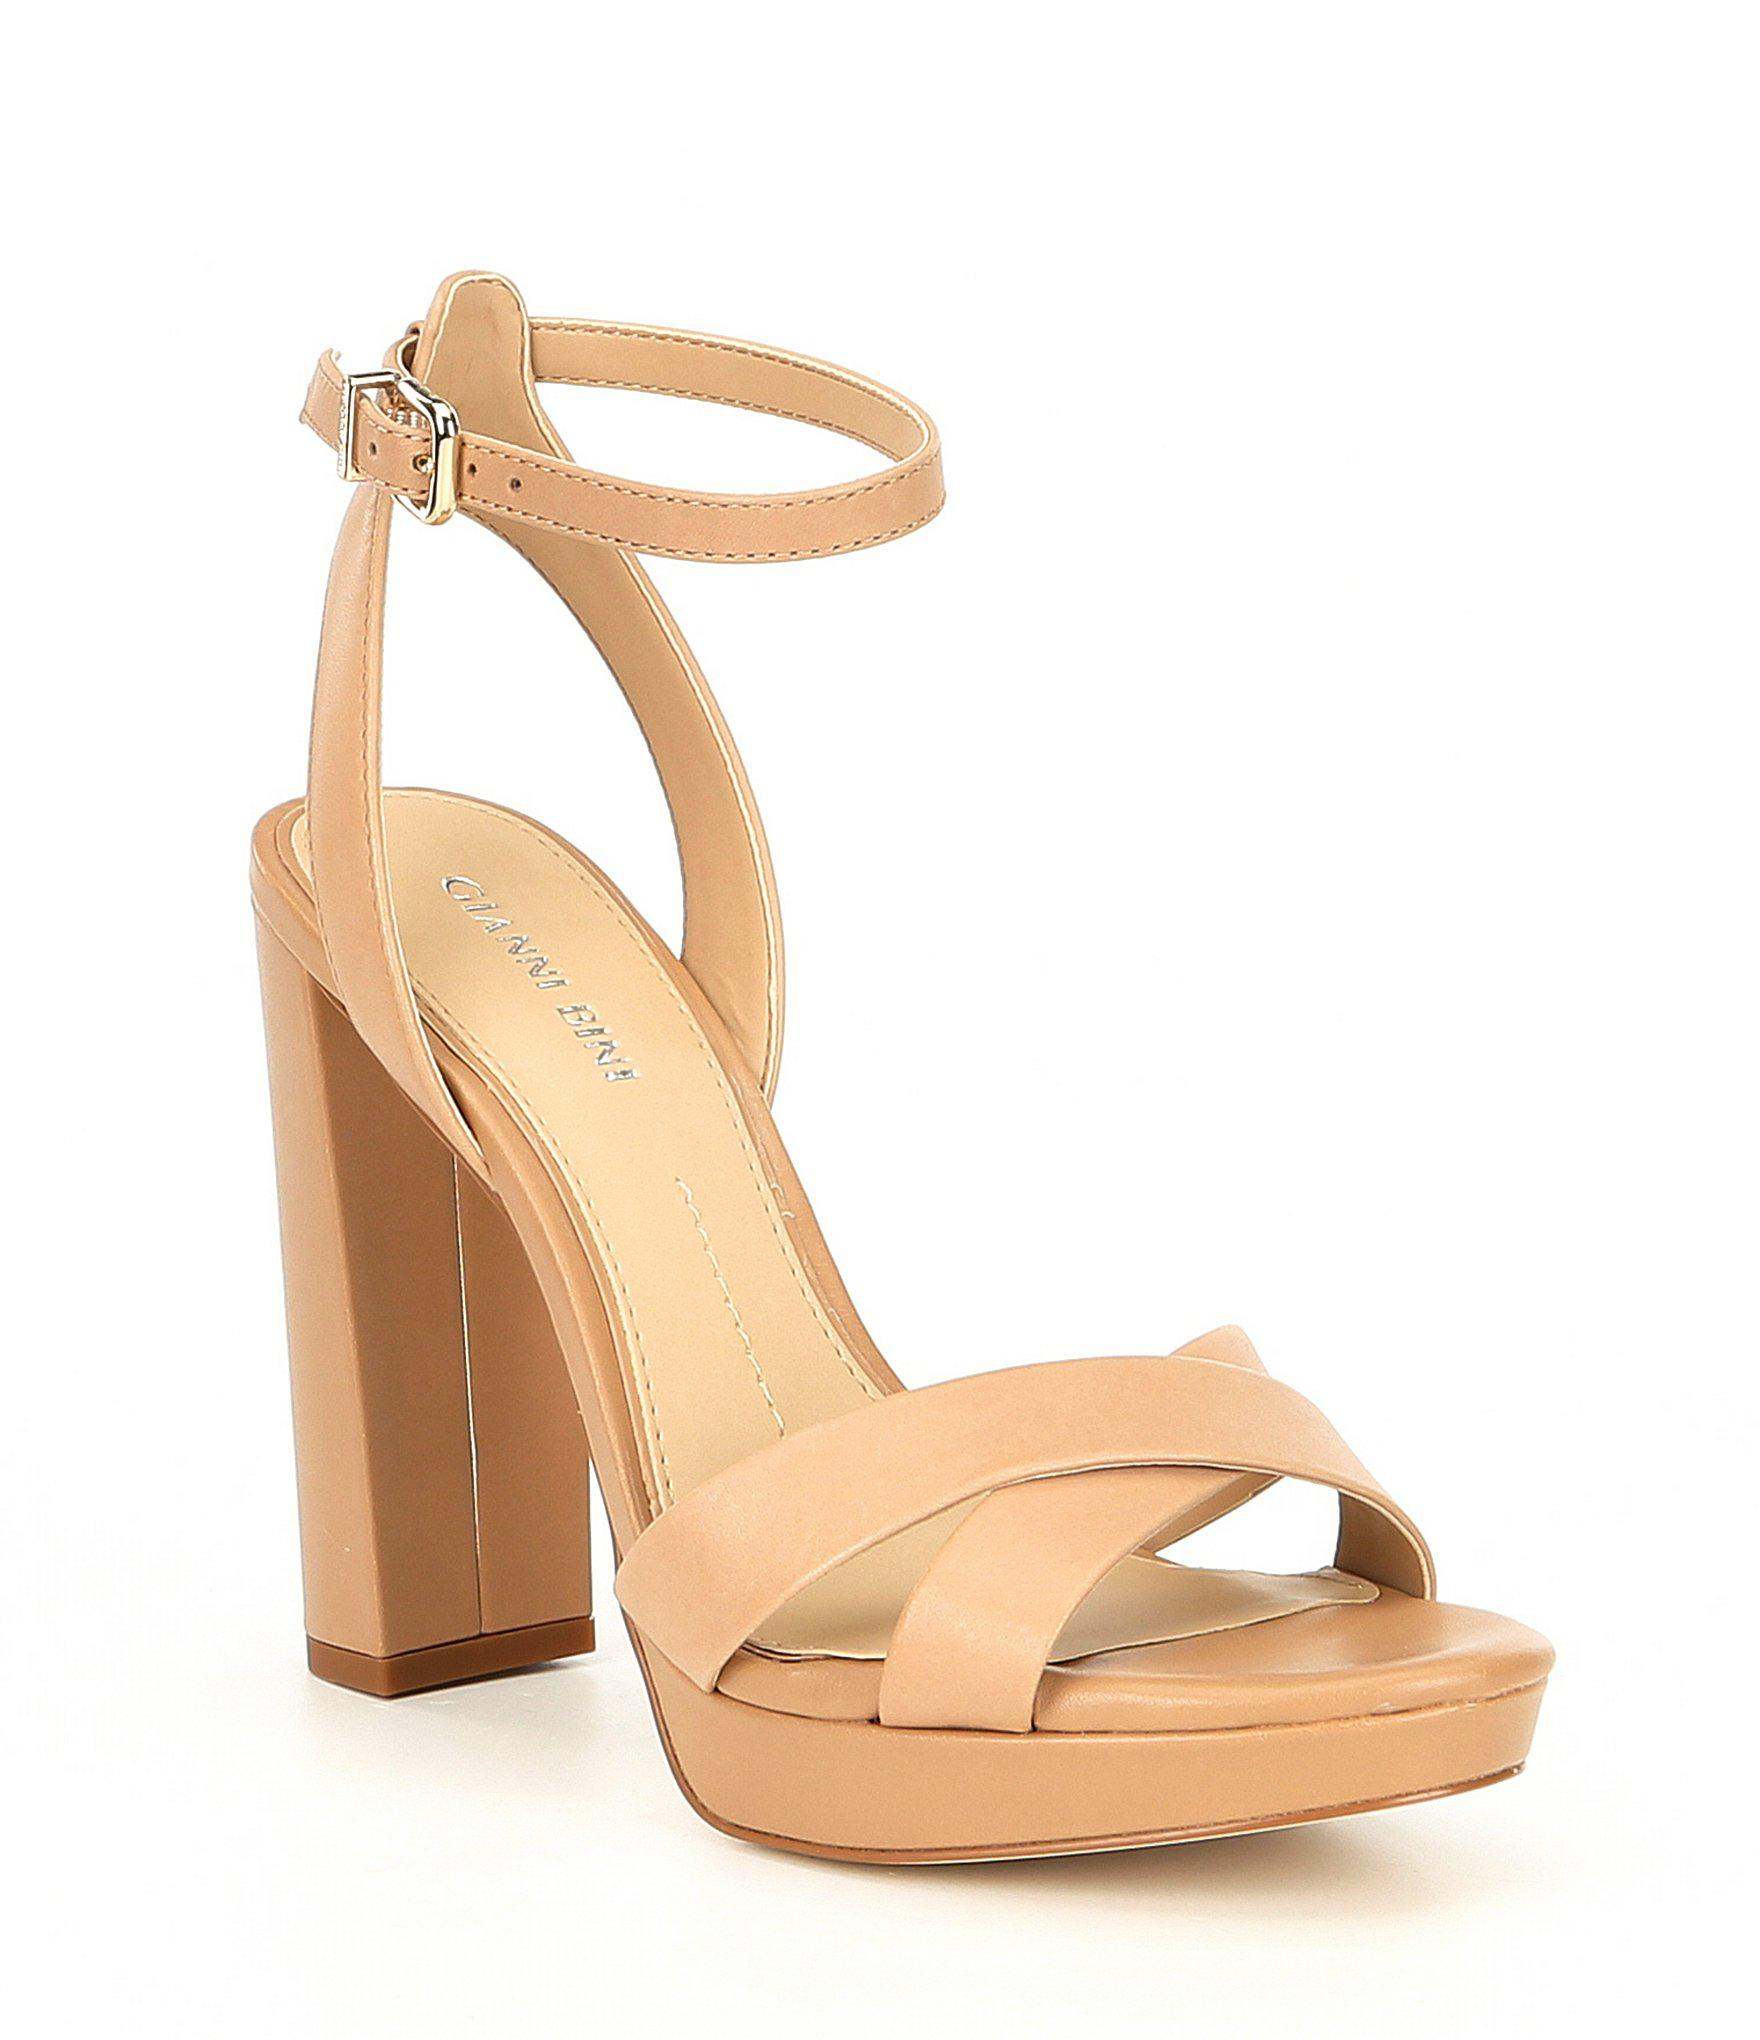 45cf6f99ce2 Gianni Bini. Women s Veeniz Leather Block Heel Dress Sandals